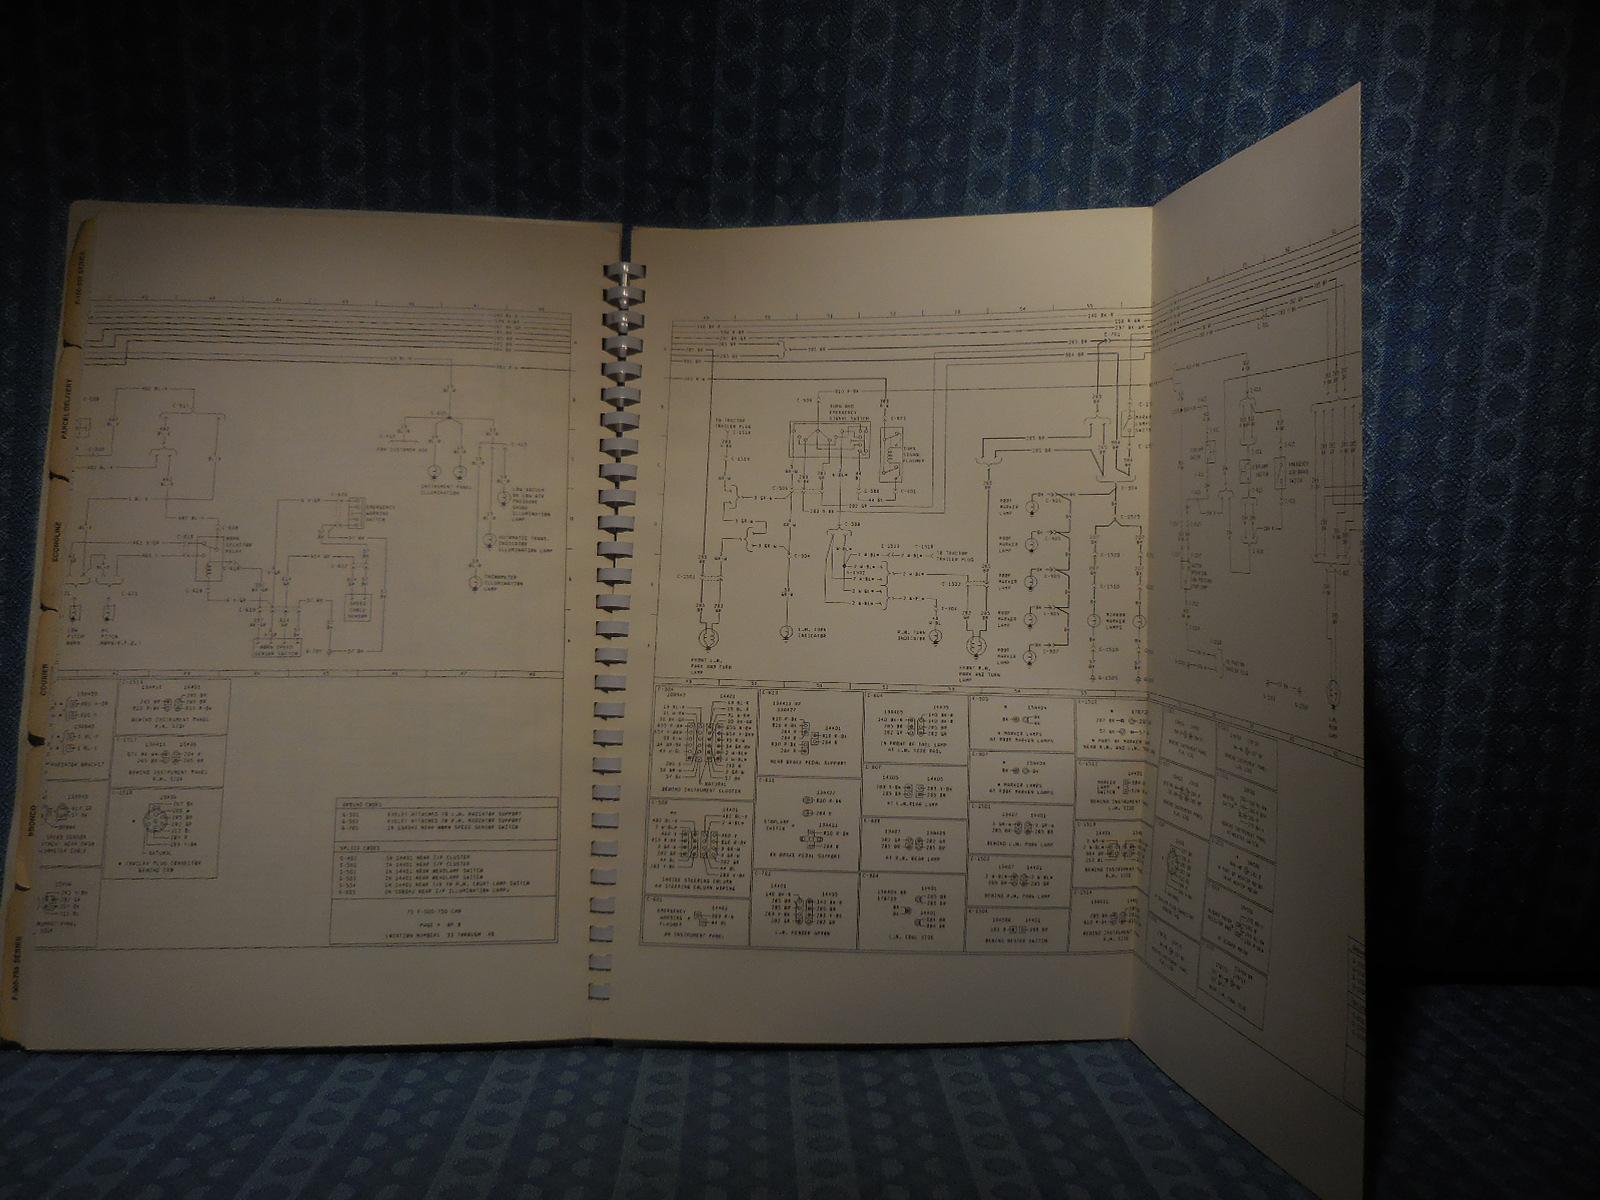 1975 Ford Truck OEM Wiring Diagrams Bronco, Pickup ...